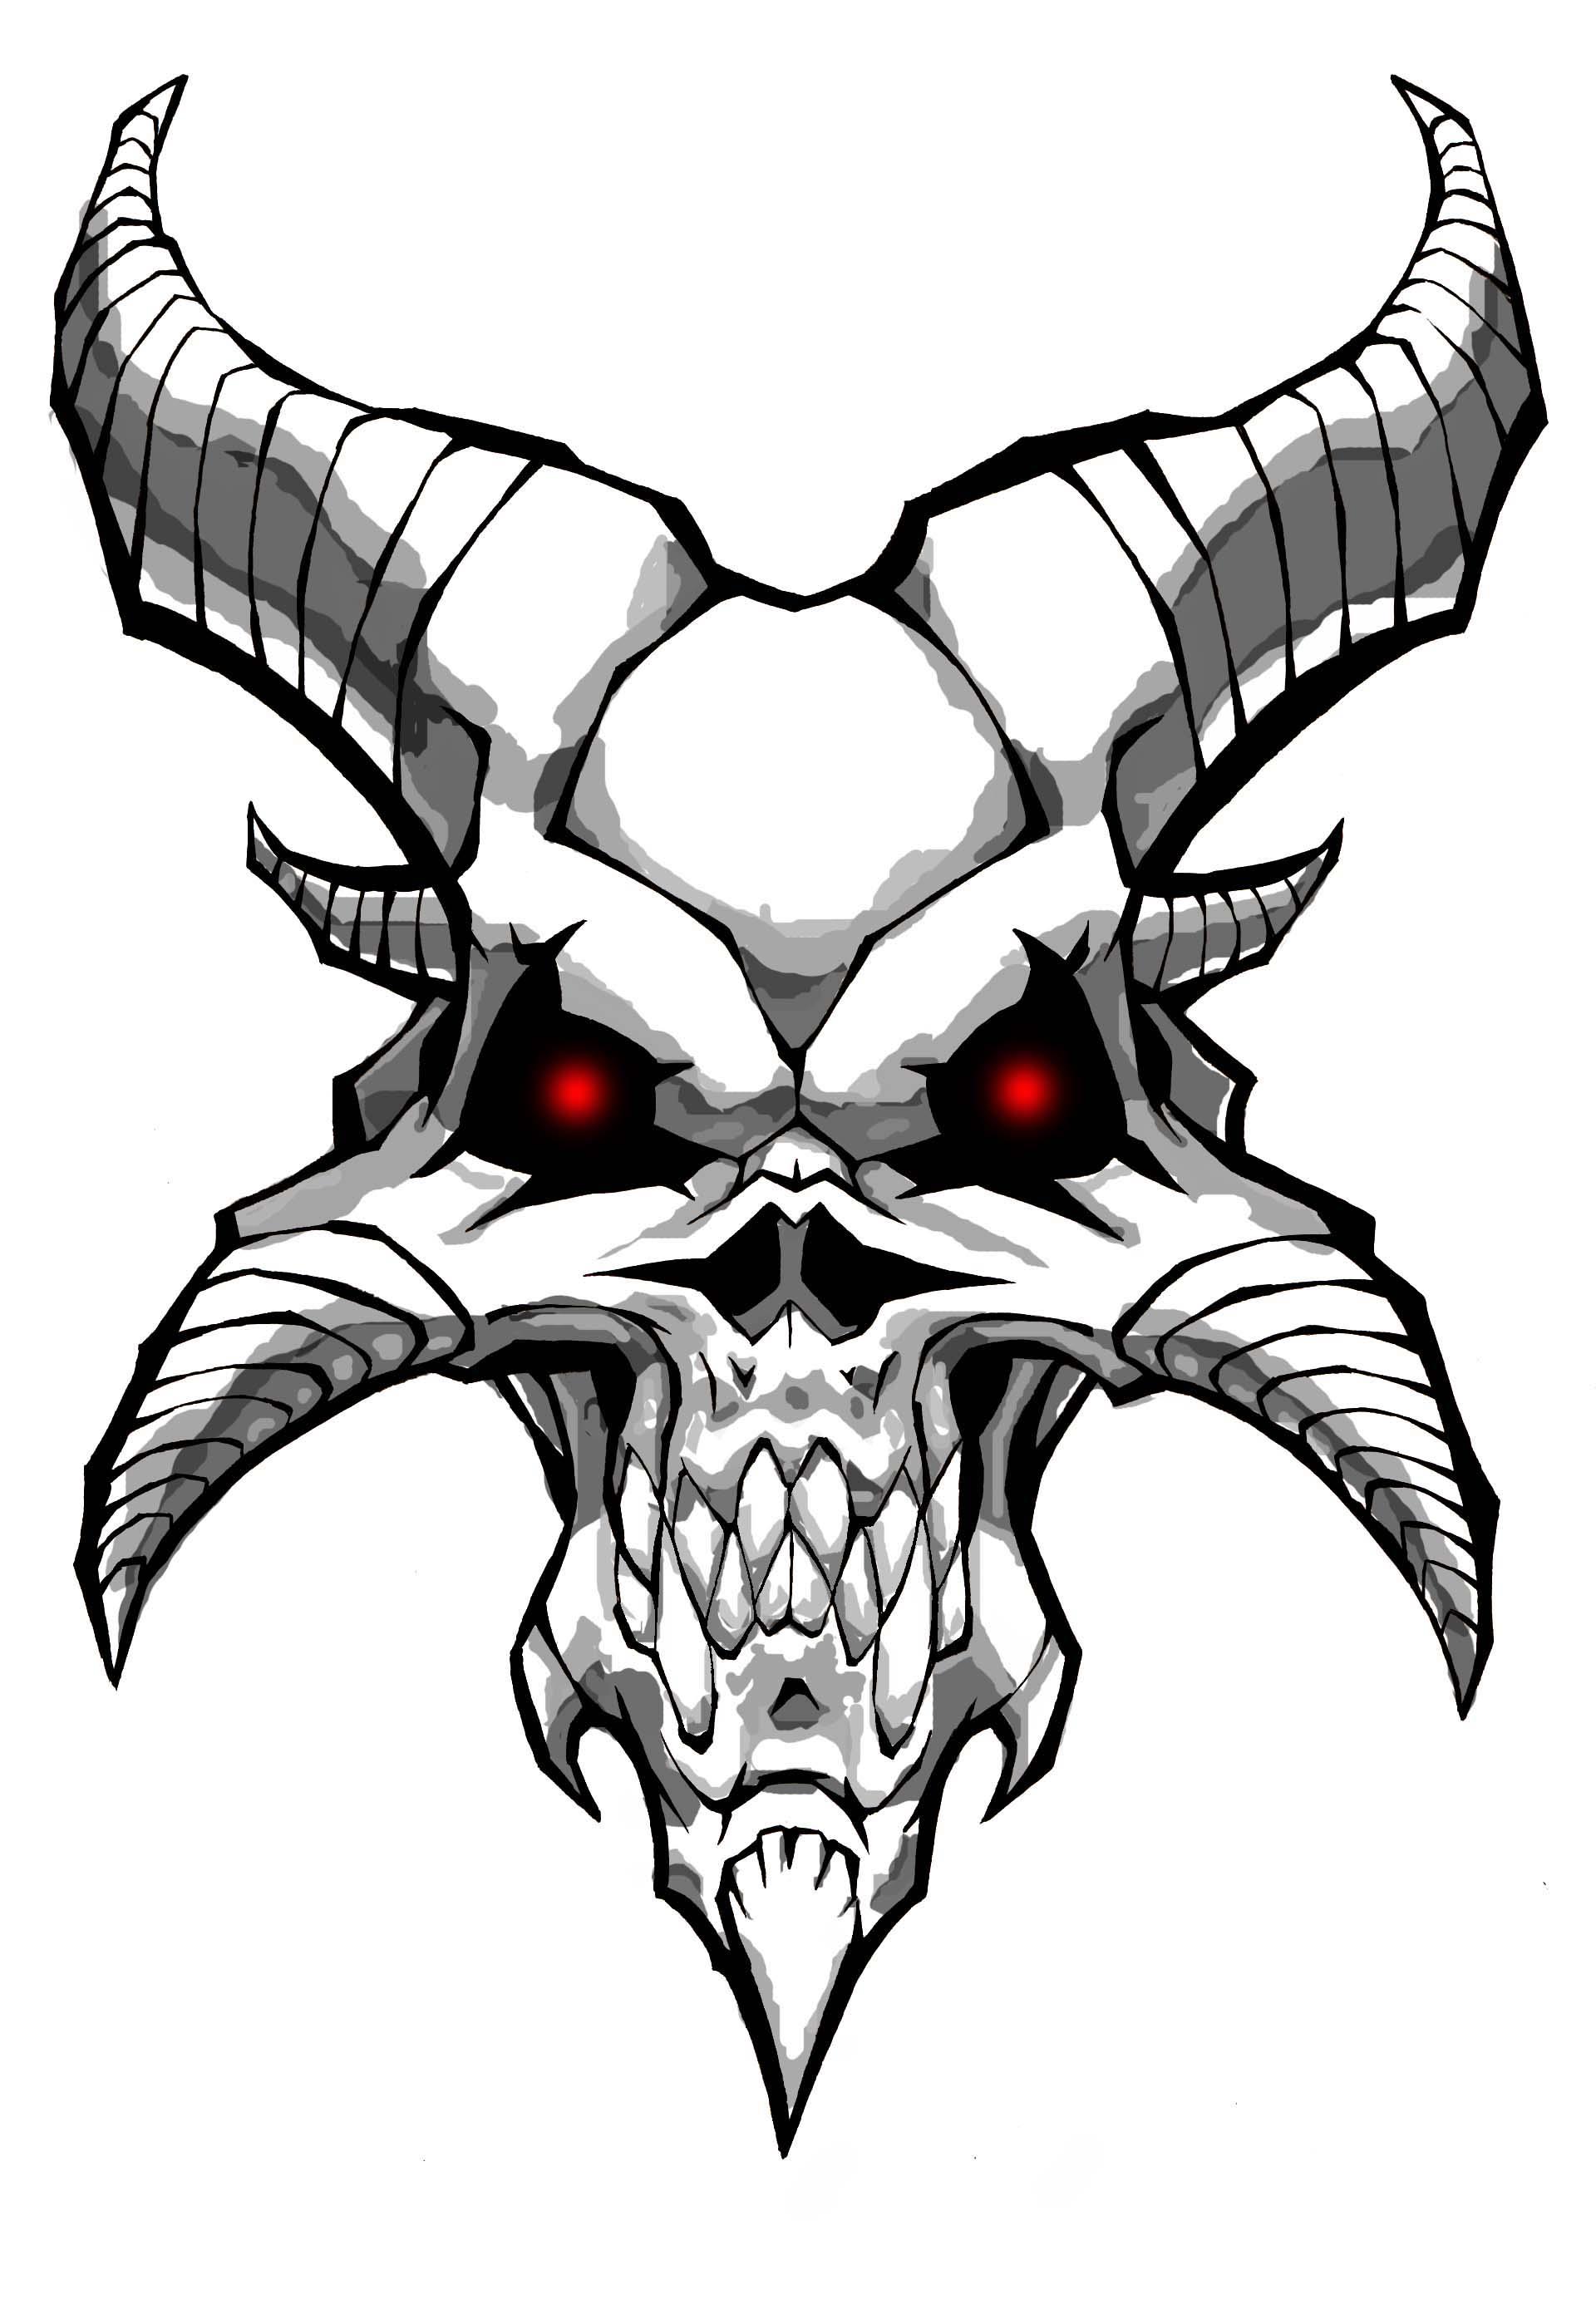 Dragon Skull Drawings.